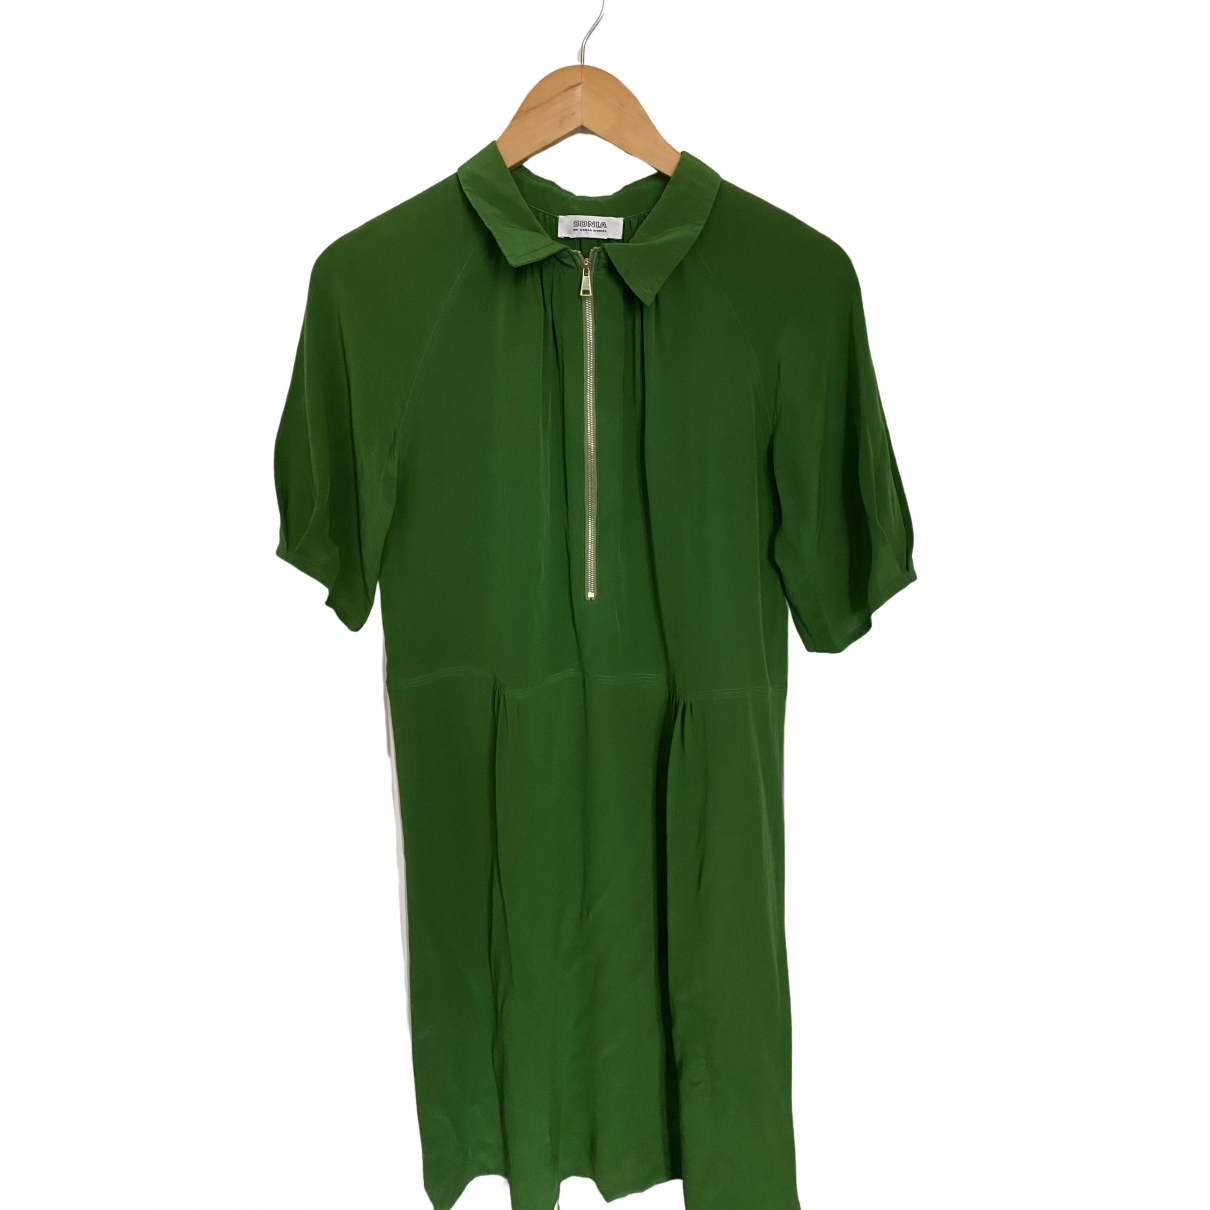 Sonia By Sonia Rykiel - Robe   pour femme en soie - vert